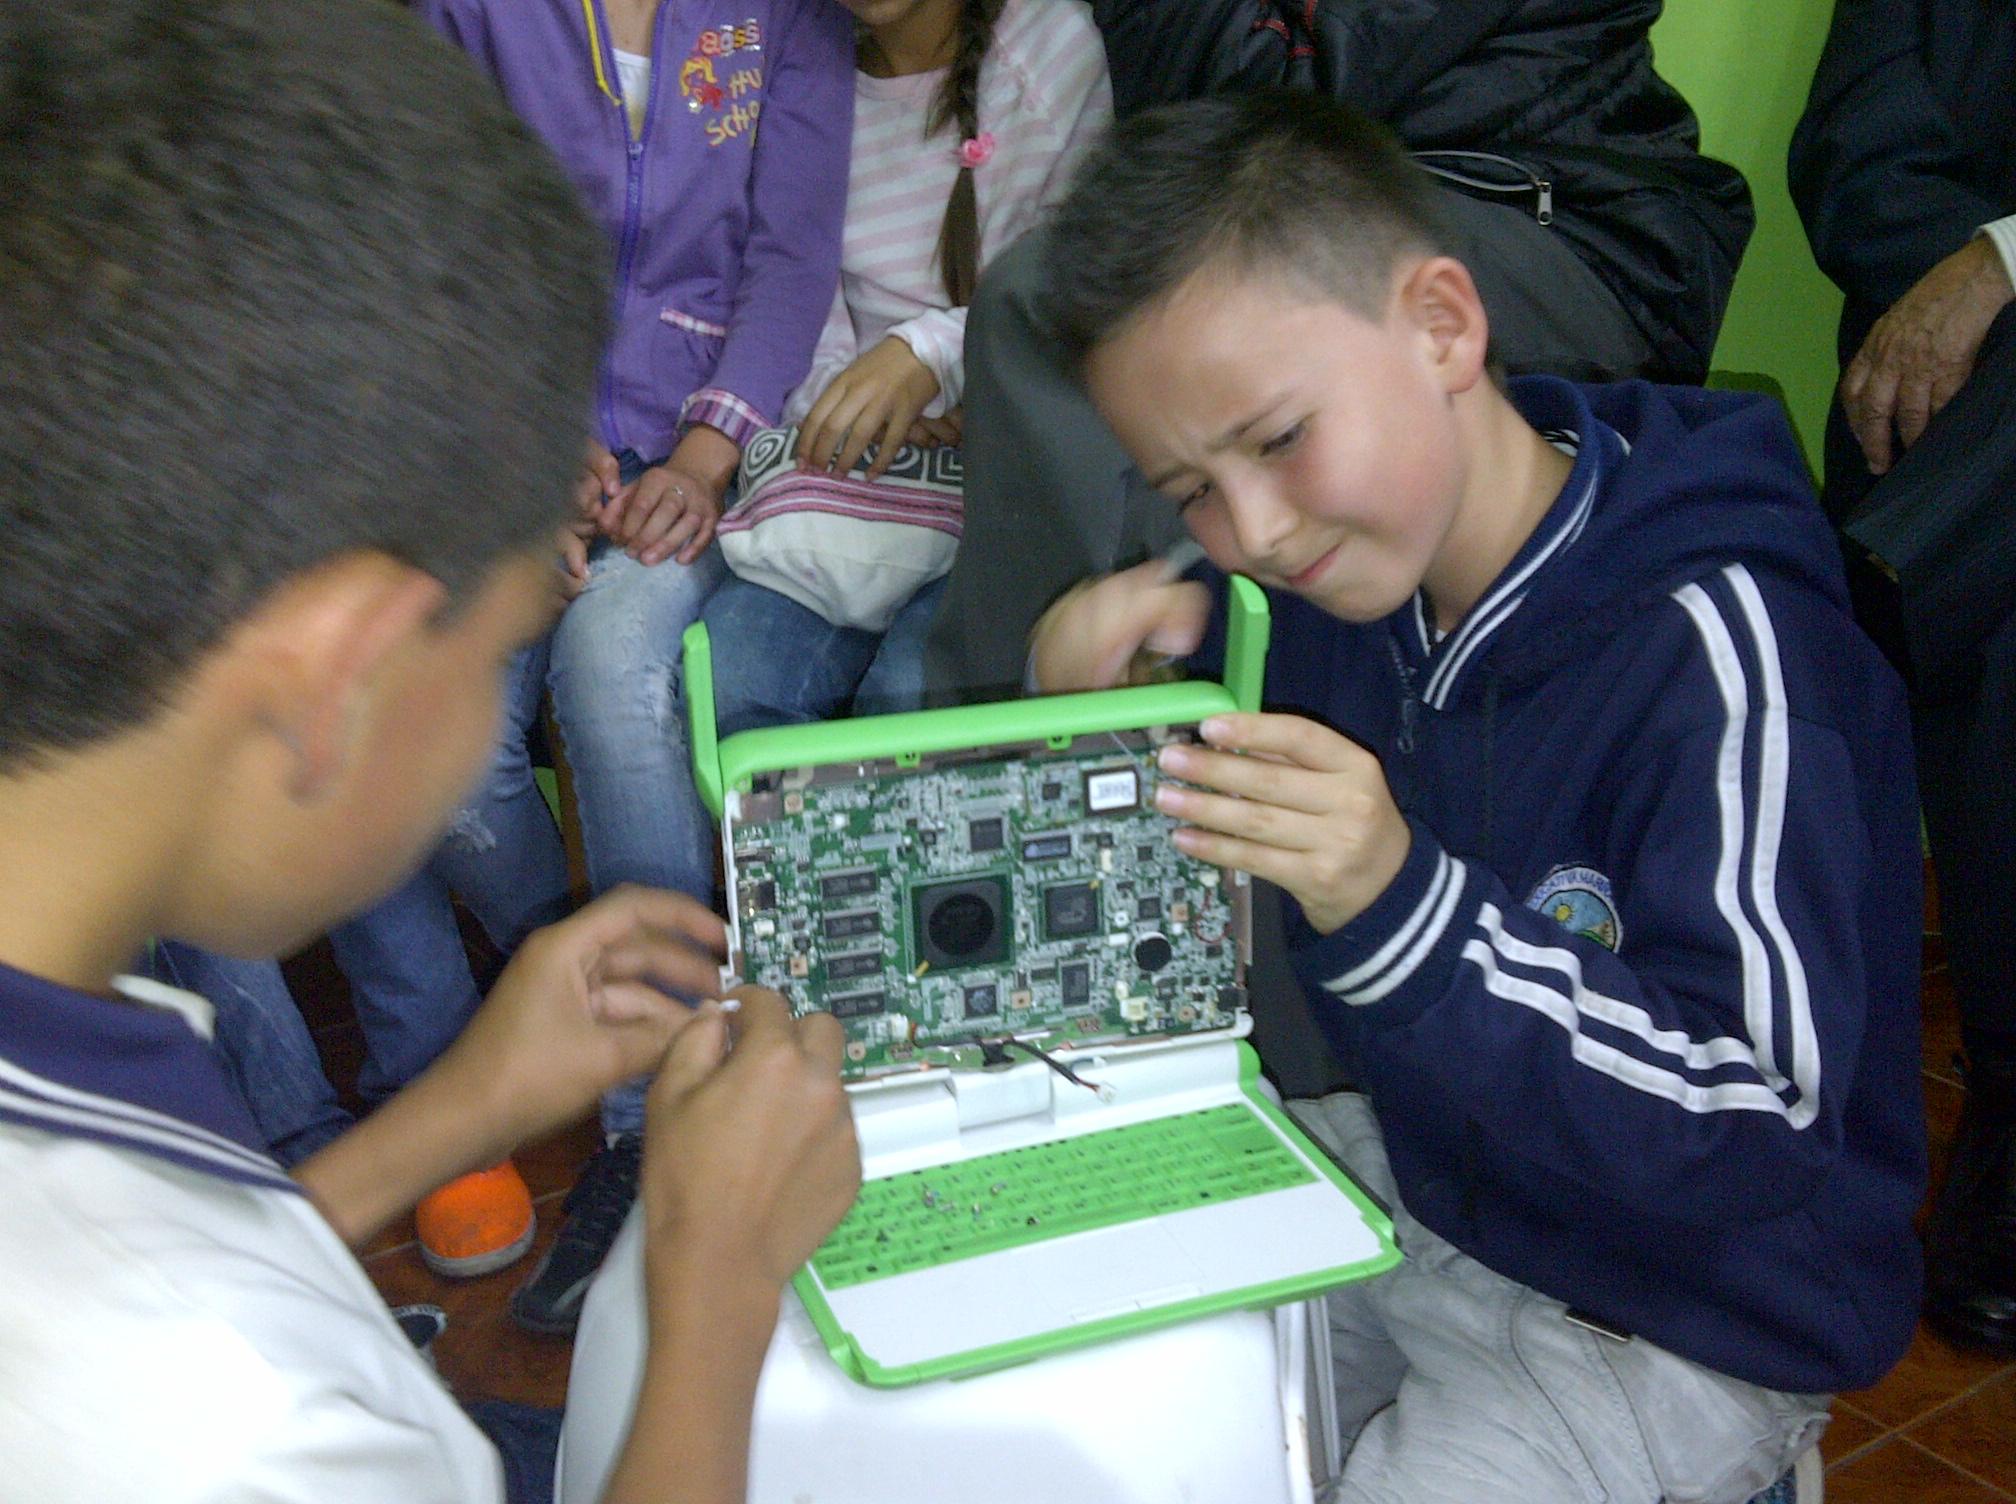 14 boys repairing computers